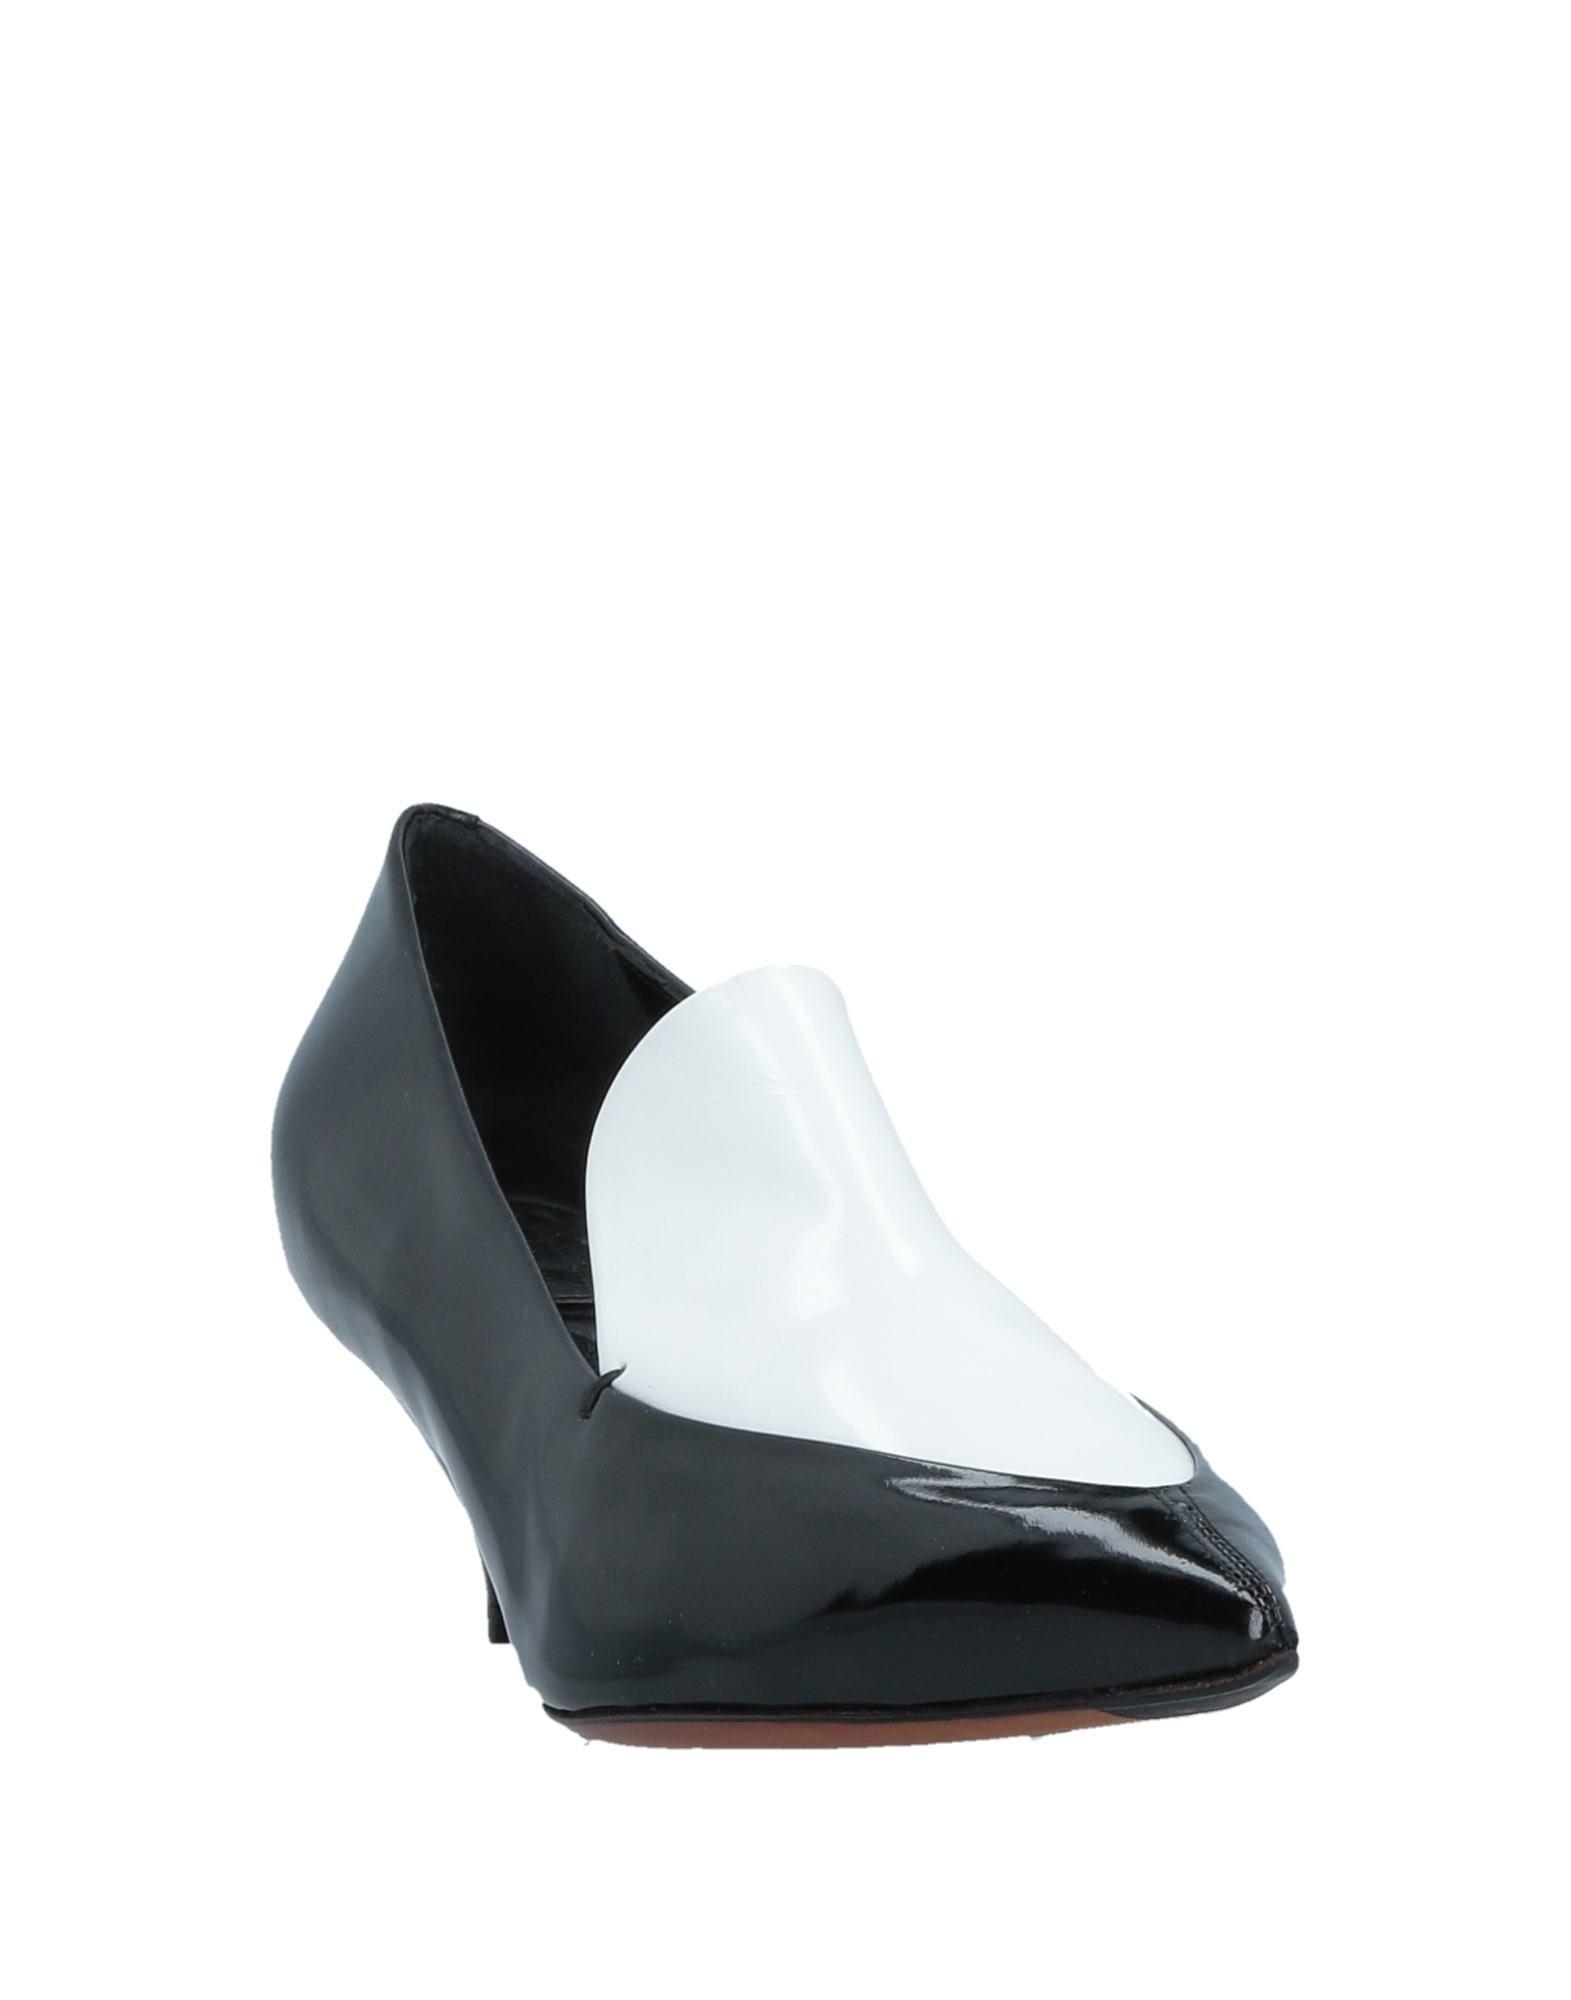 Céline Mokassins aussehende Damen  11521506LHGünstige gut aussehende Mokassins Schuhe ac2aaf